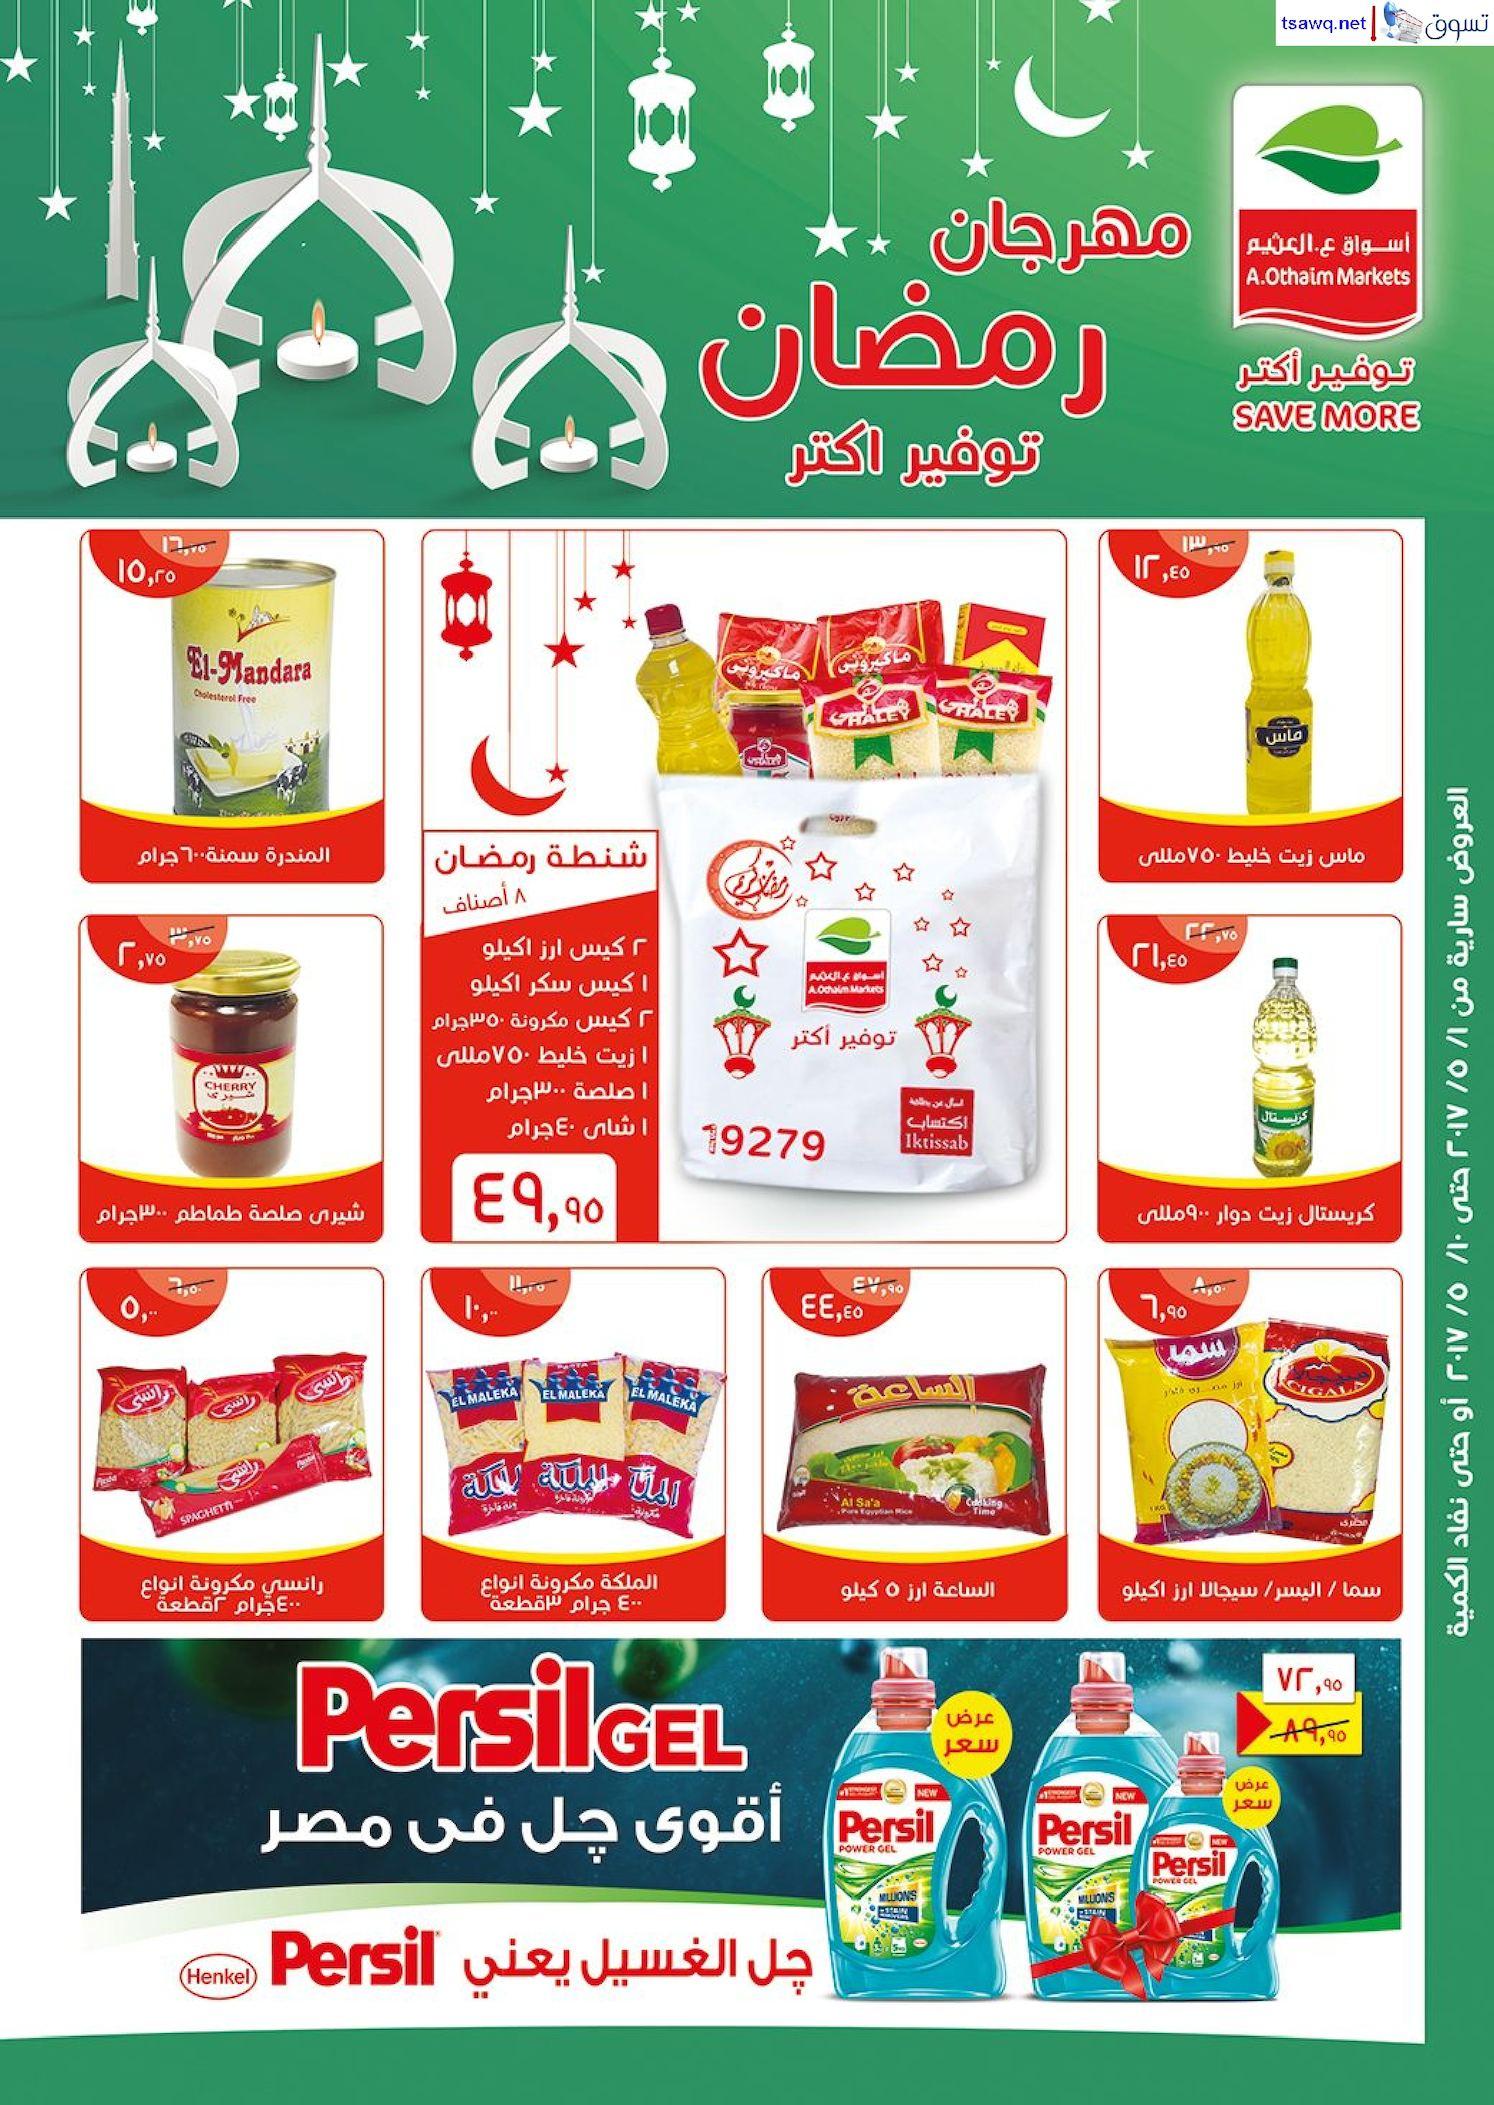 0ef89fad7 عروض العثيم مصر من 1 مايو حتى 10 مايو 2017 مهرجان رمضان   تسوق نت